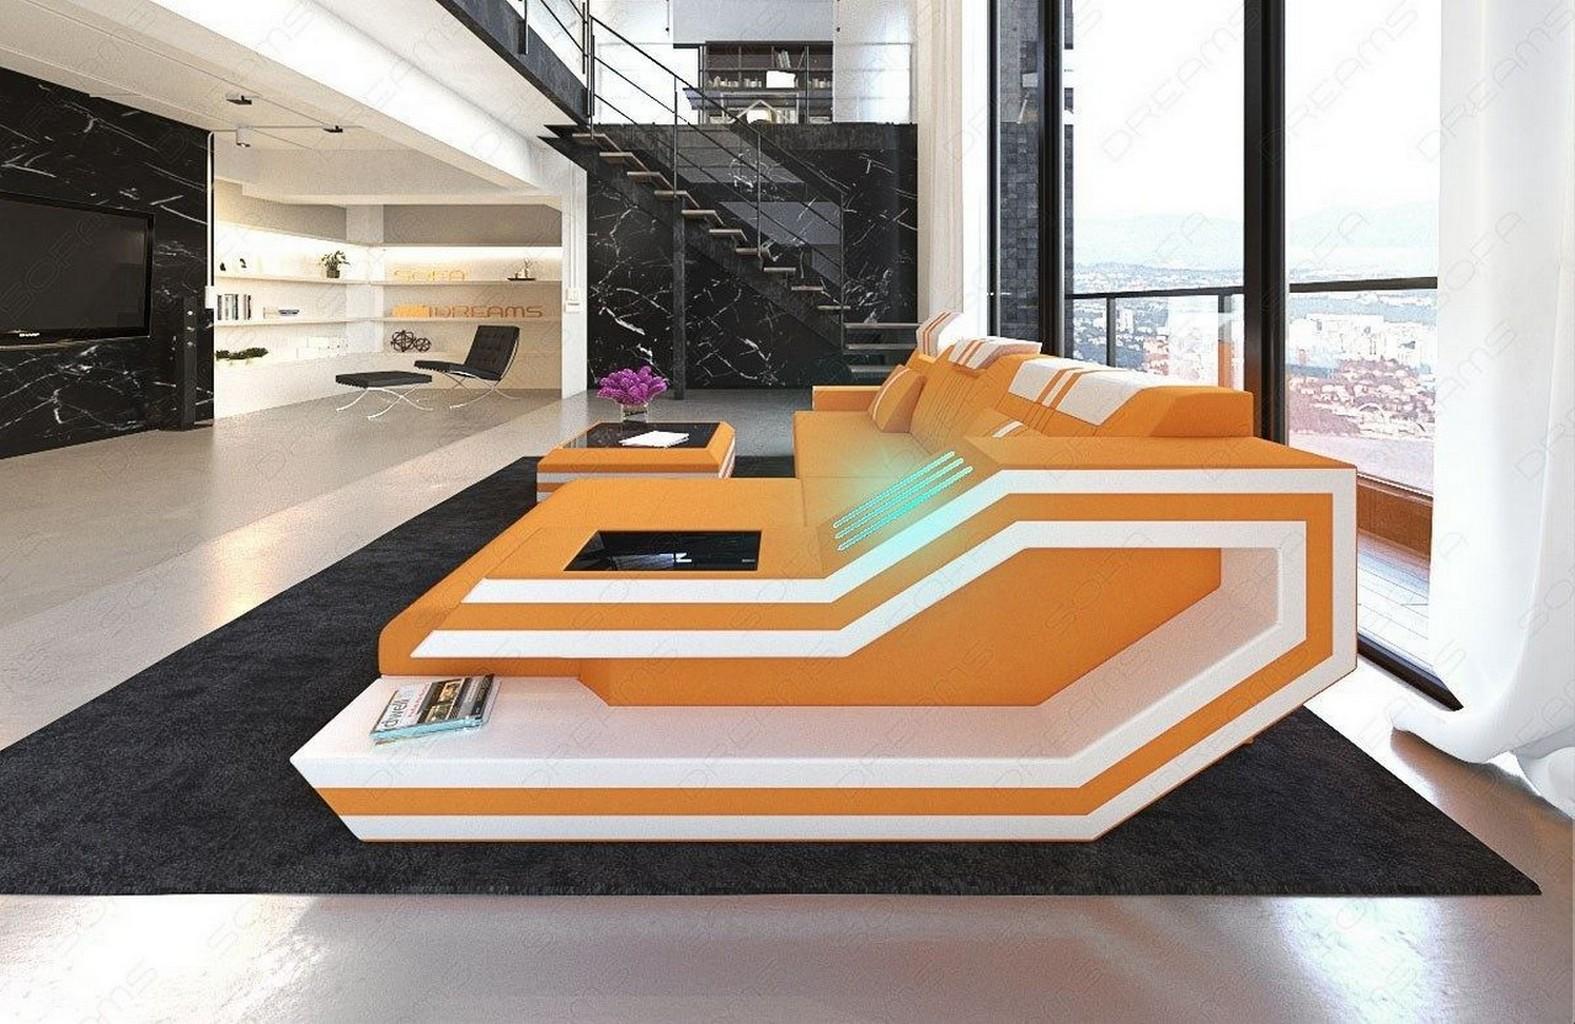 pigmentflecken mit backpulver entfernen 80. Black Bedroom Furniture Sets. Home Design Ideas